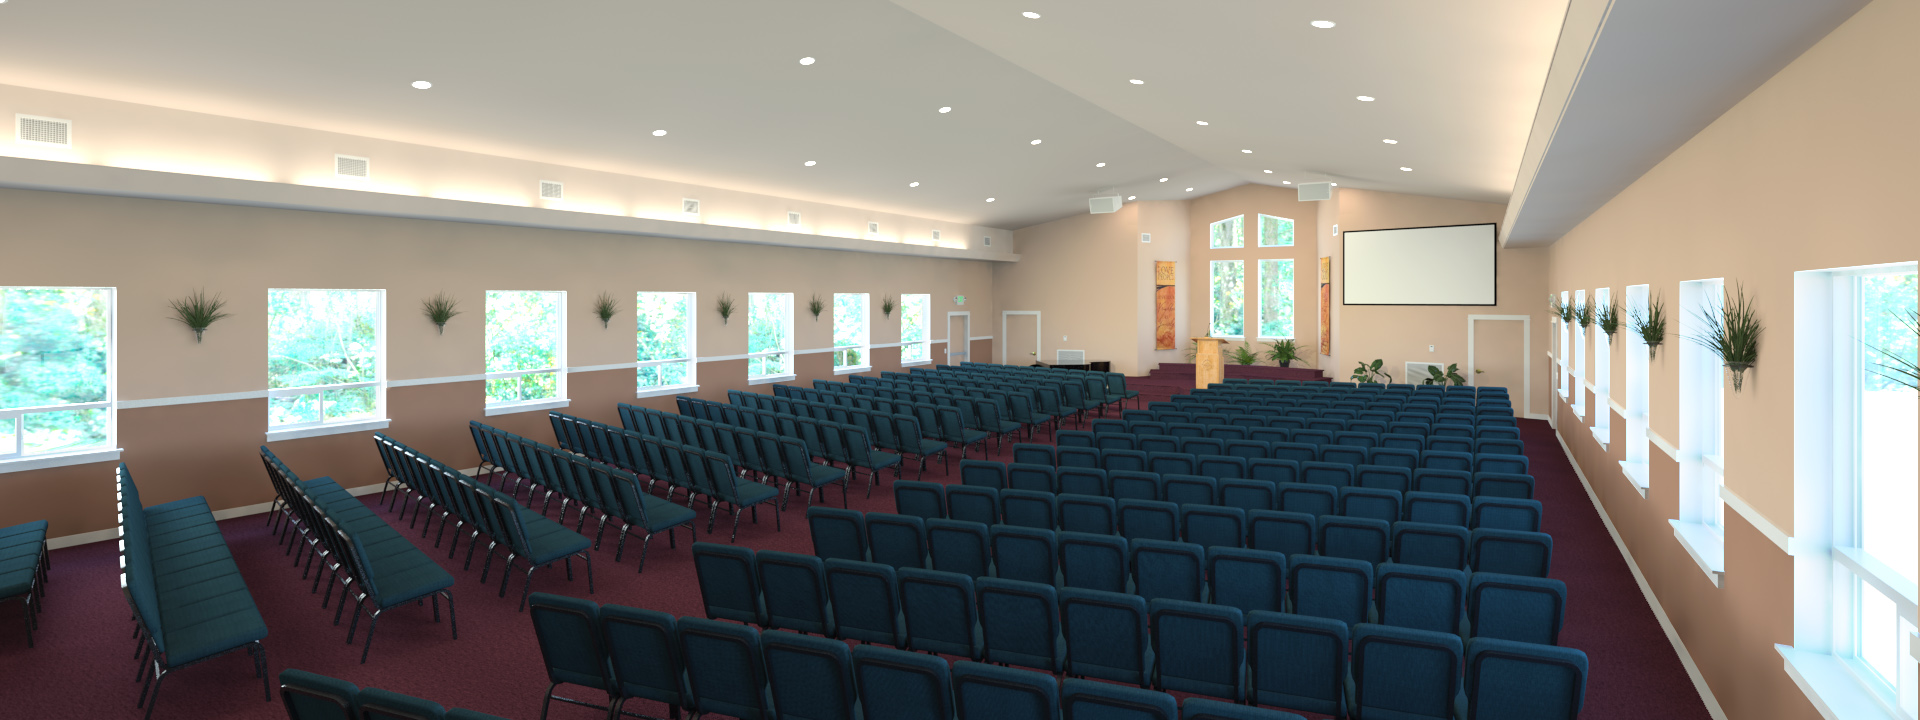 Expanded worship center. Graphic art by Josh Suko.